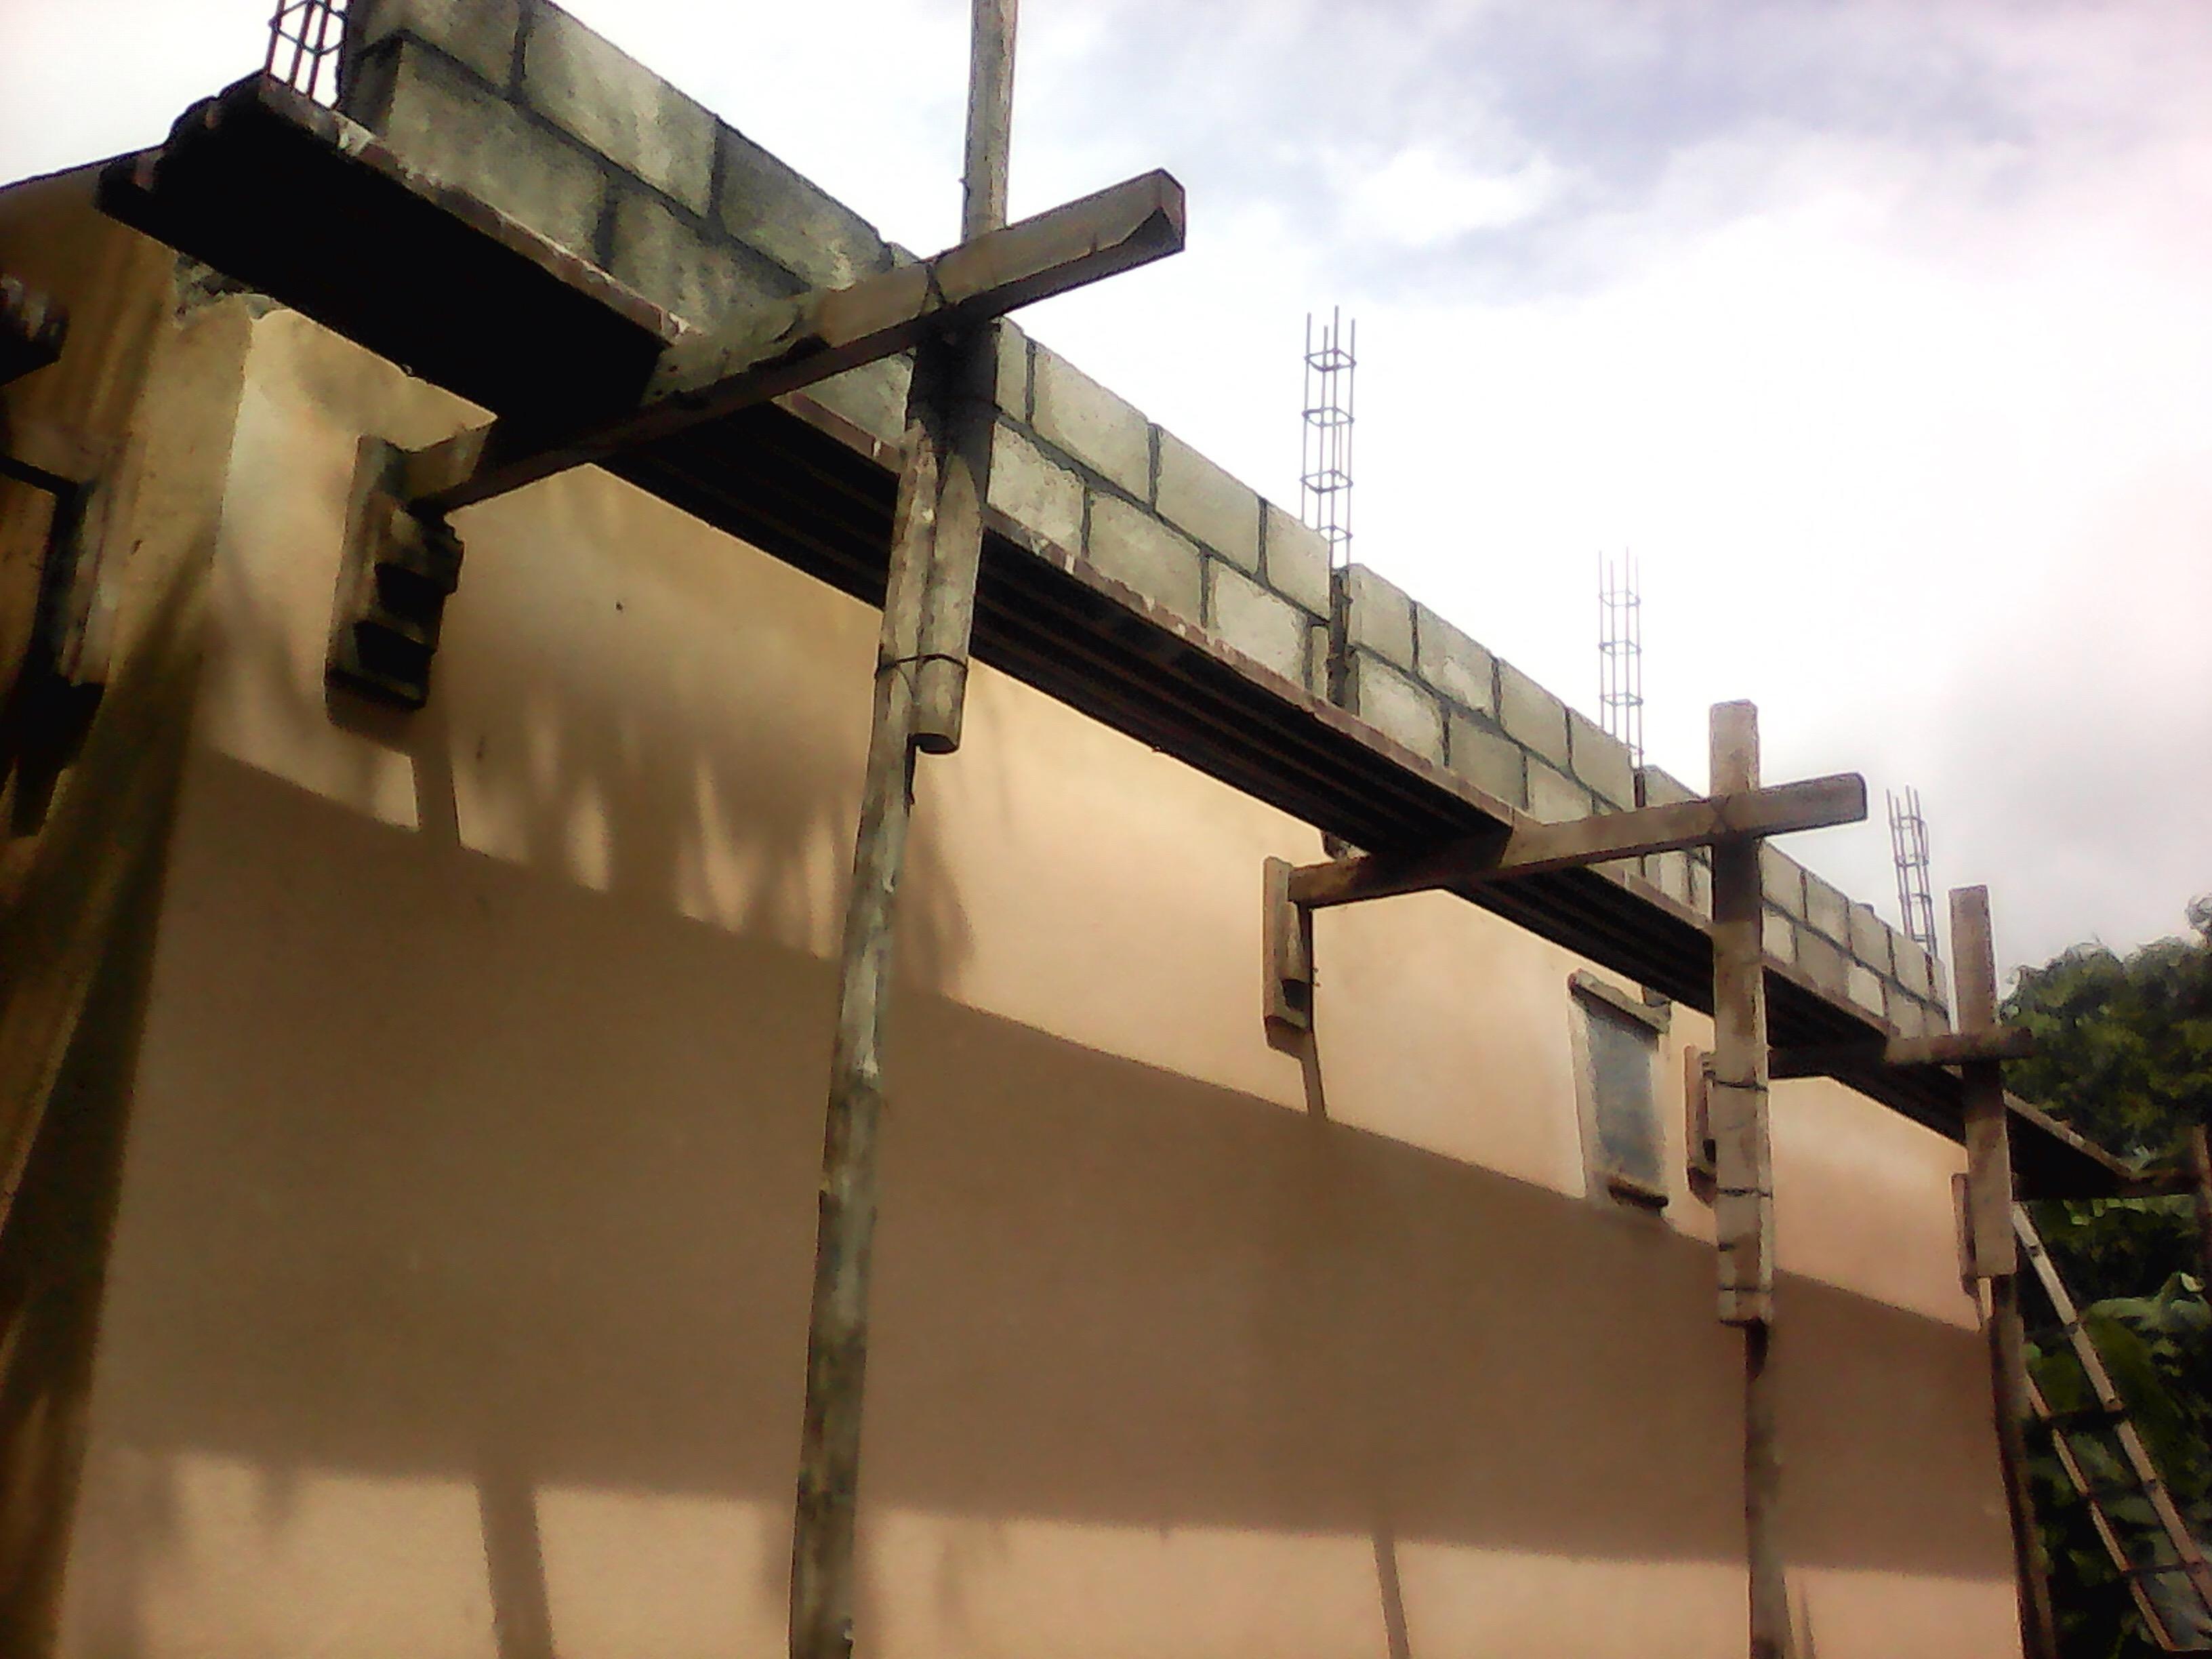 Roof_3_c.JPG